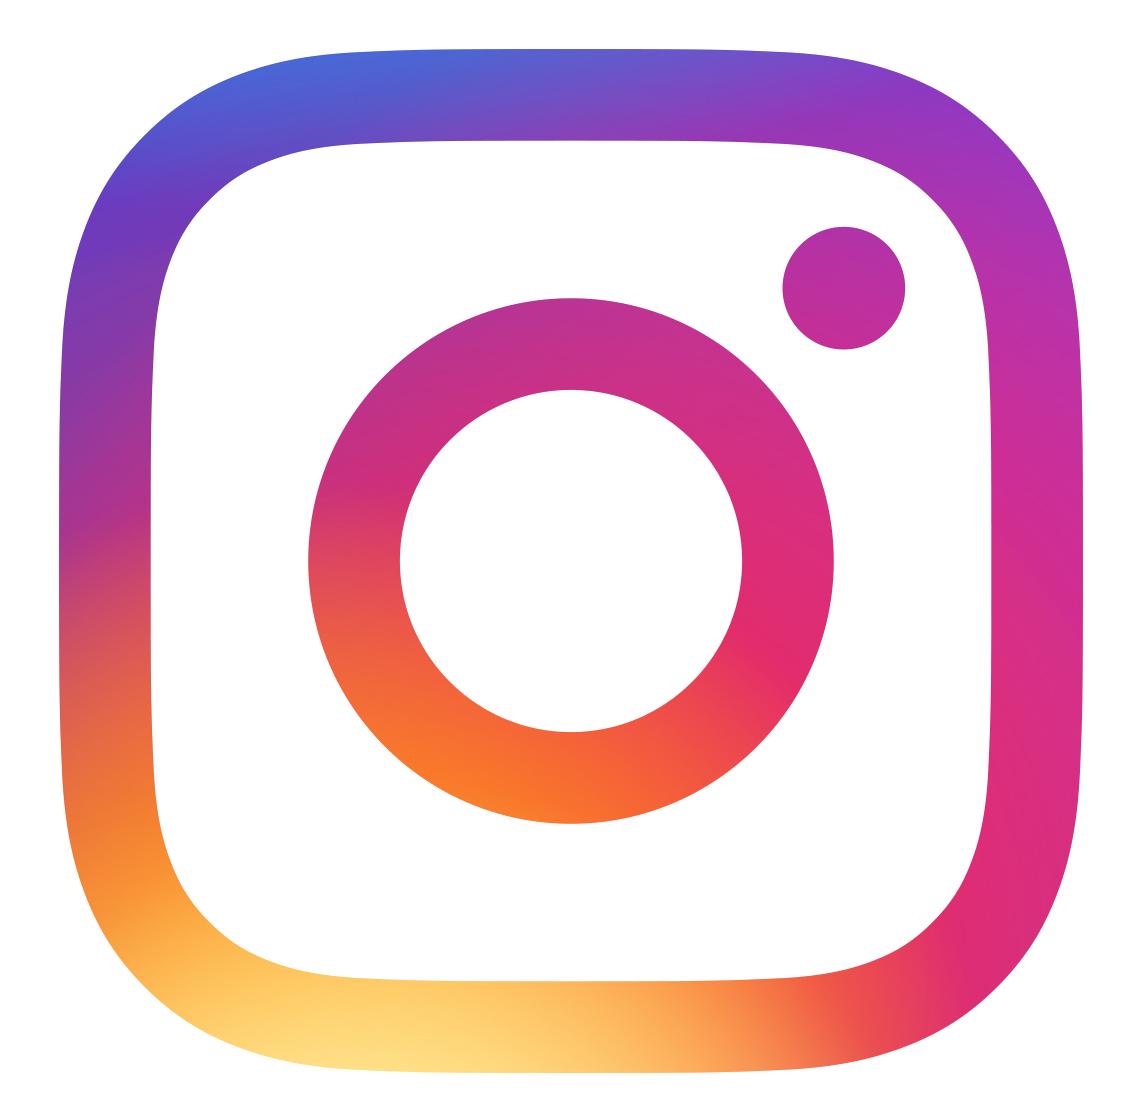 Follow Gail on Instagram!